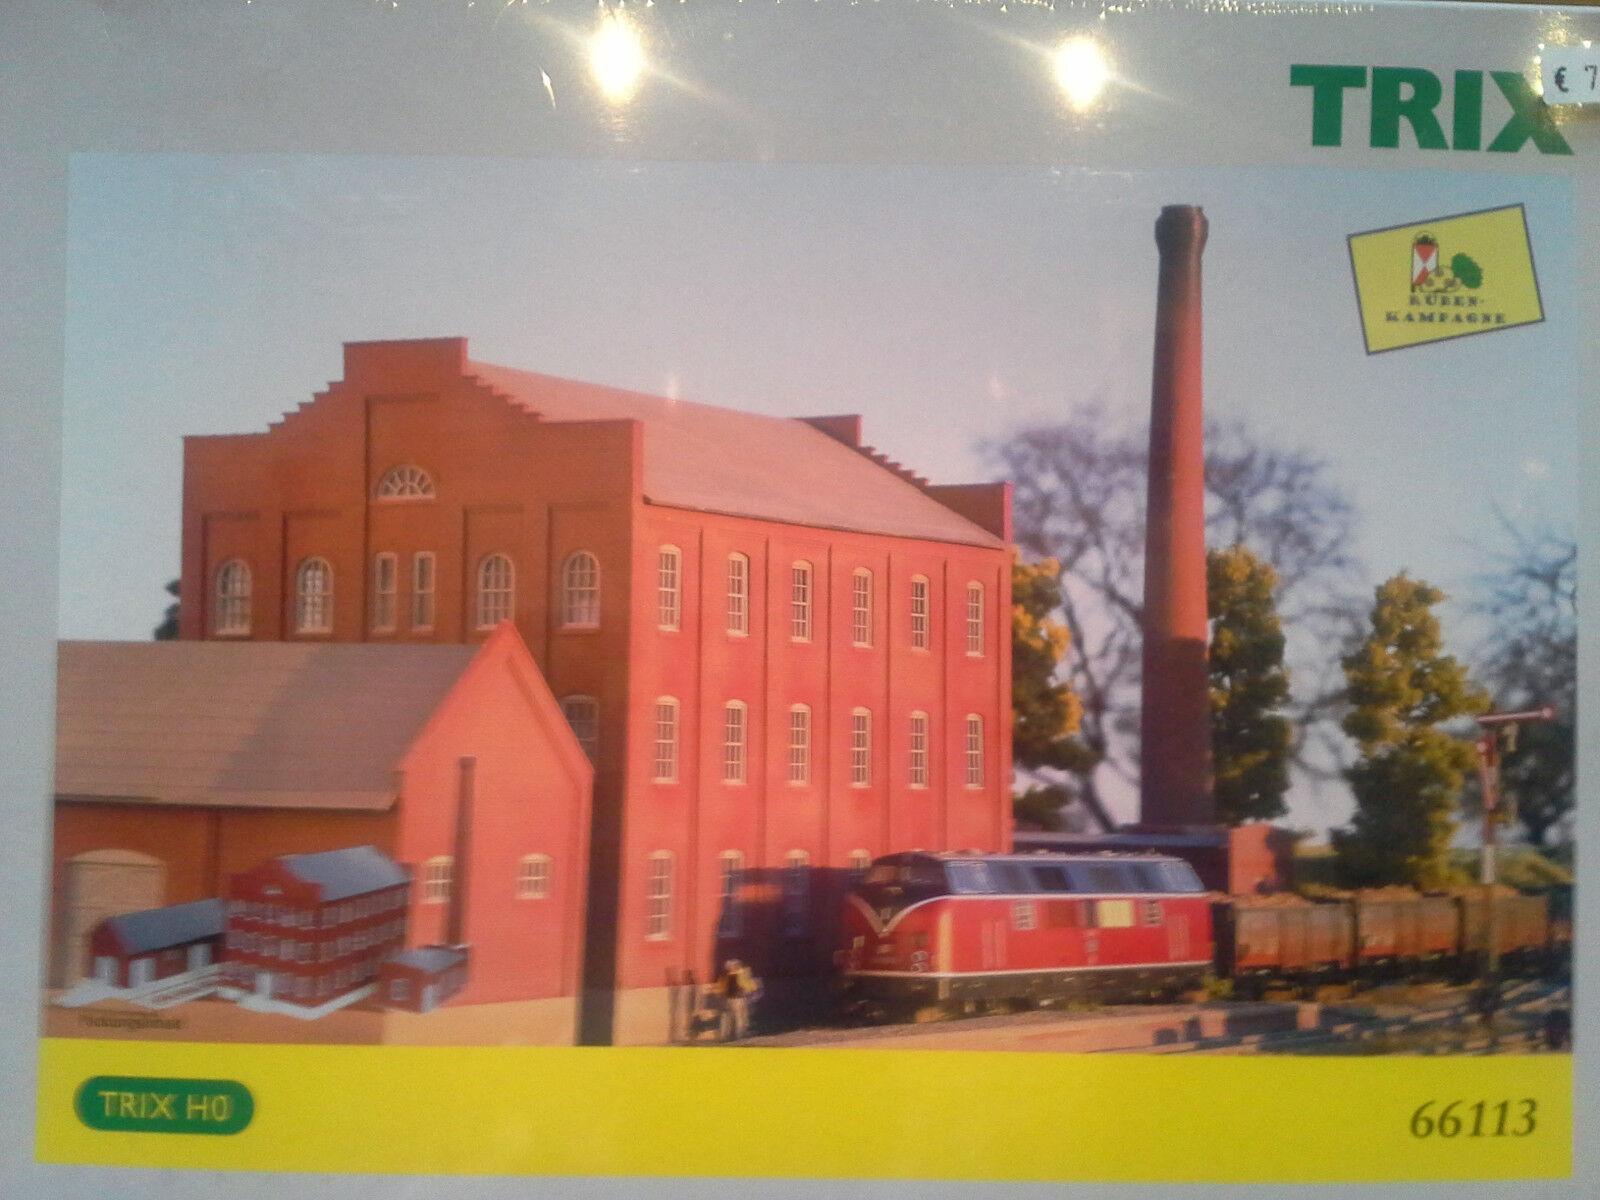 Trix kit 66113 zuckerrübenfabrik nuevo en el embalaje original